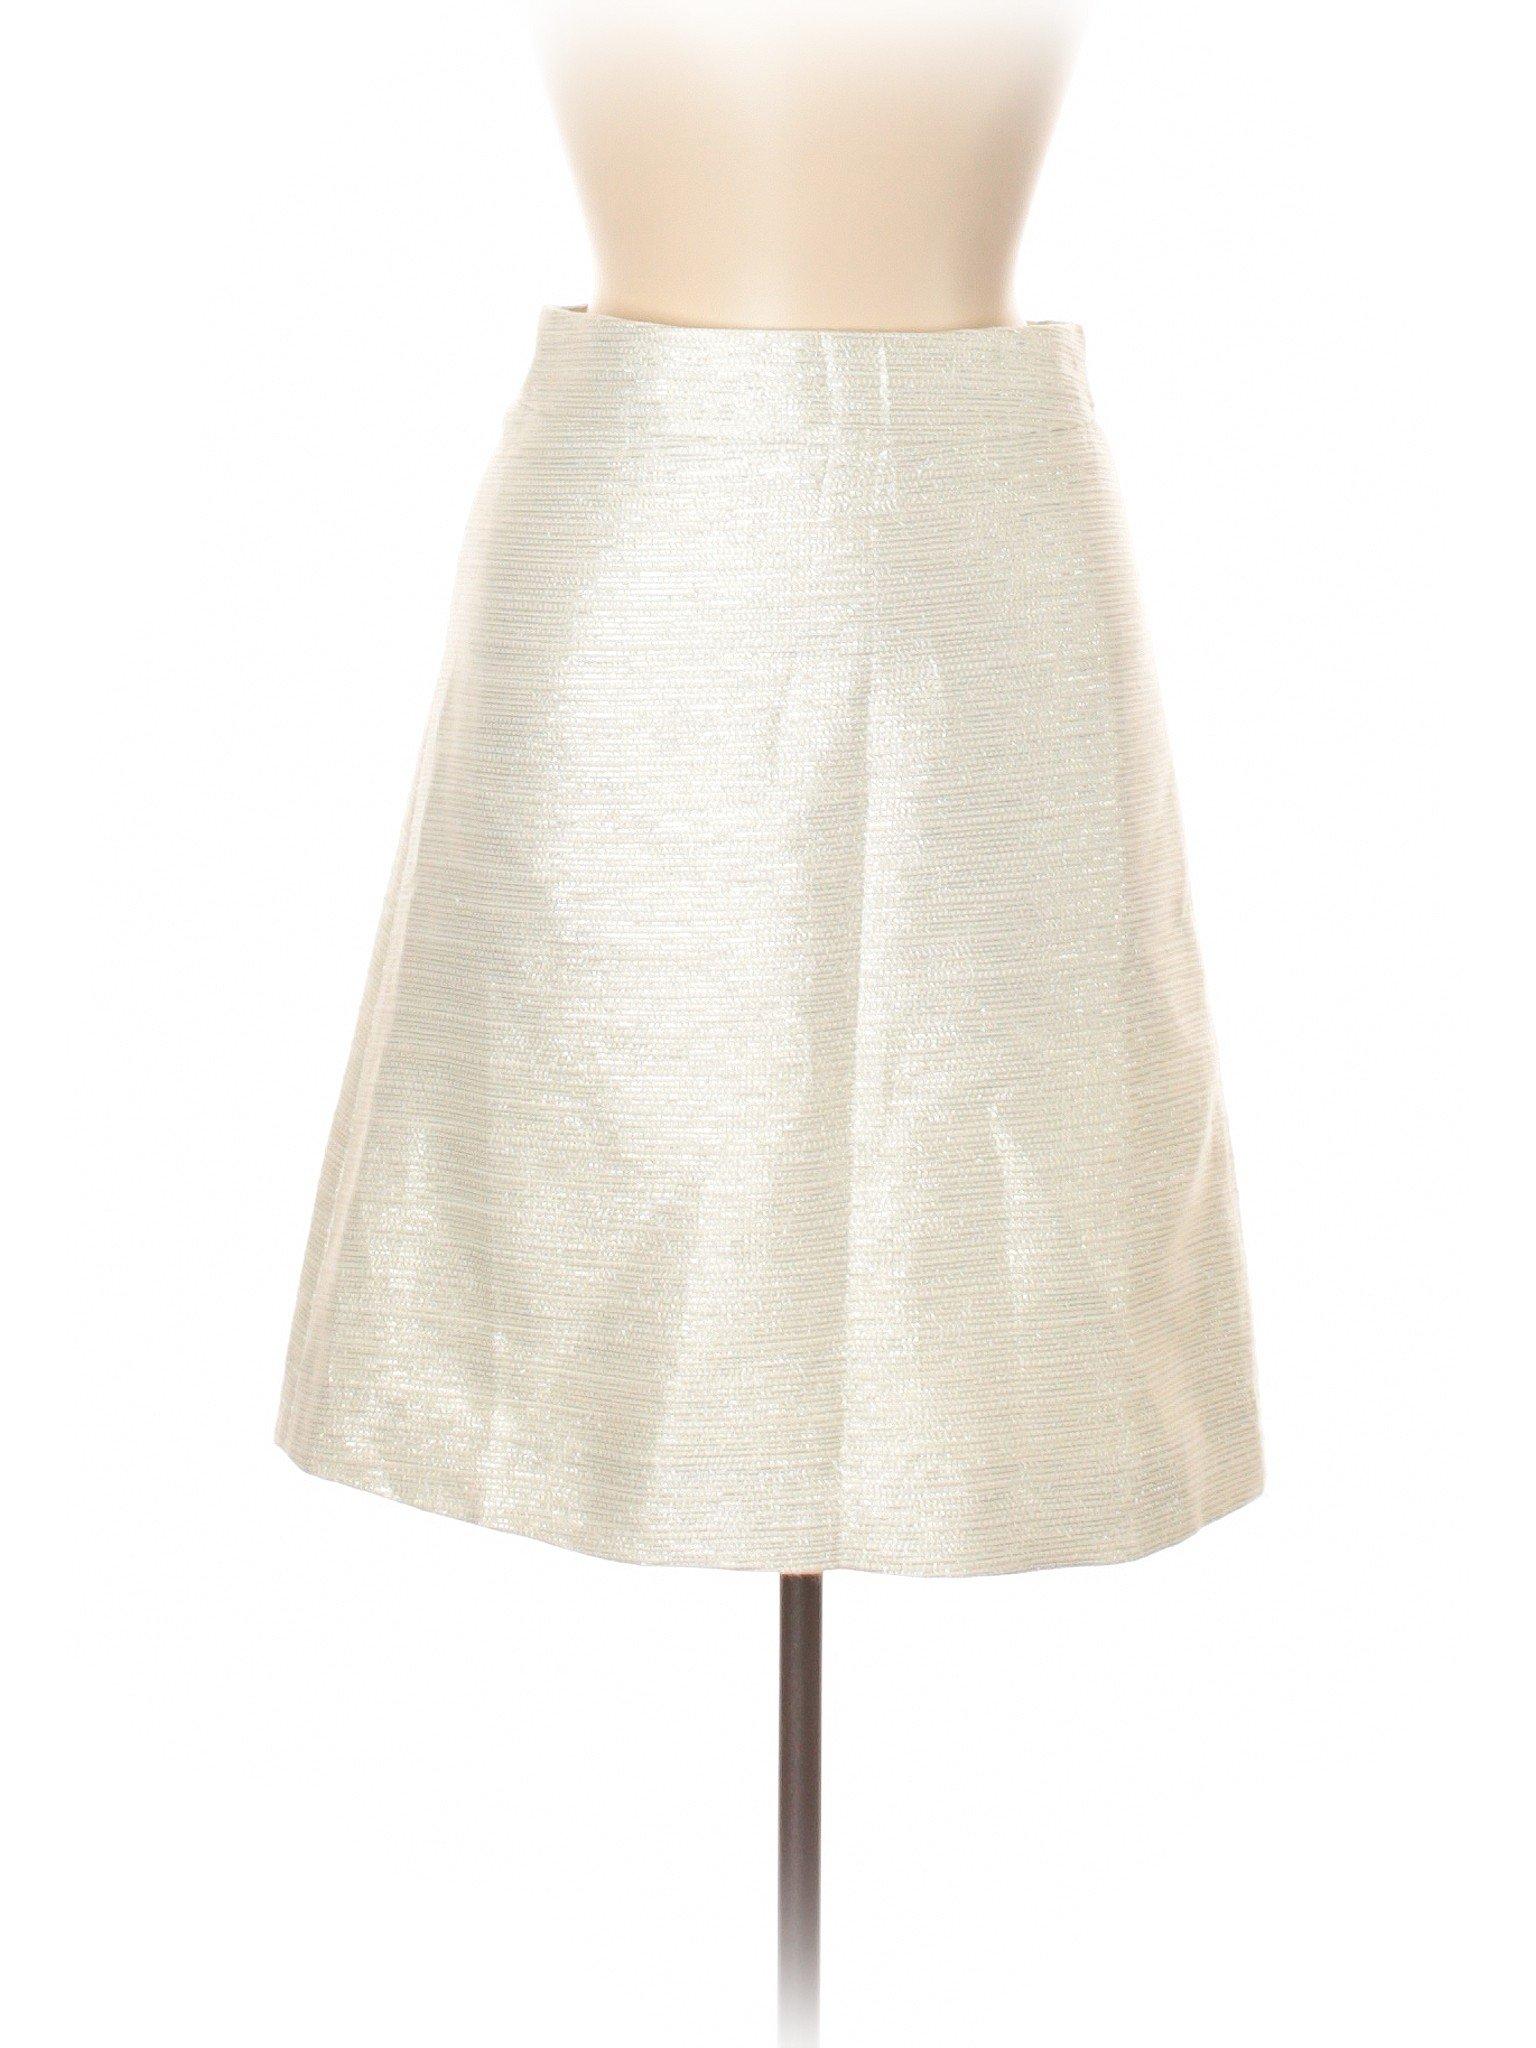 Winter Paper Formal Leisure Skirt Crown 7BRvwPqdx